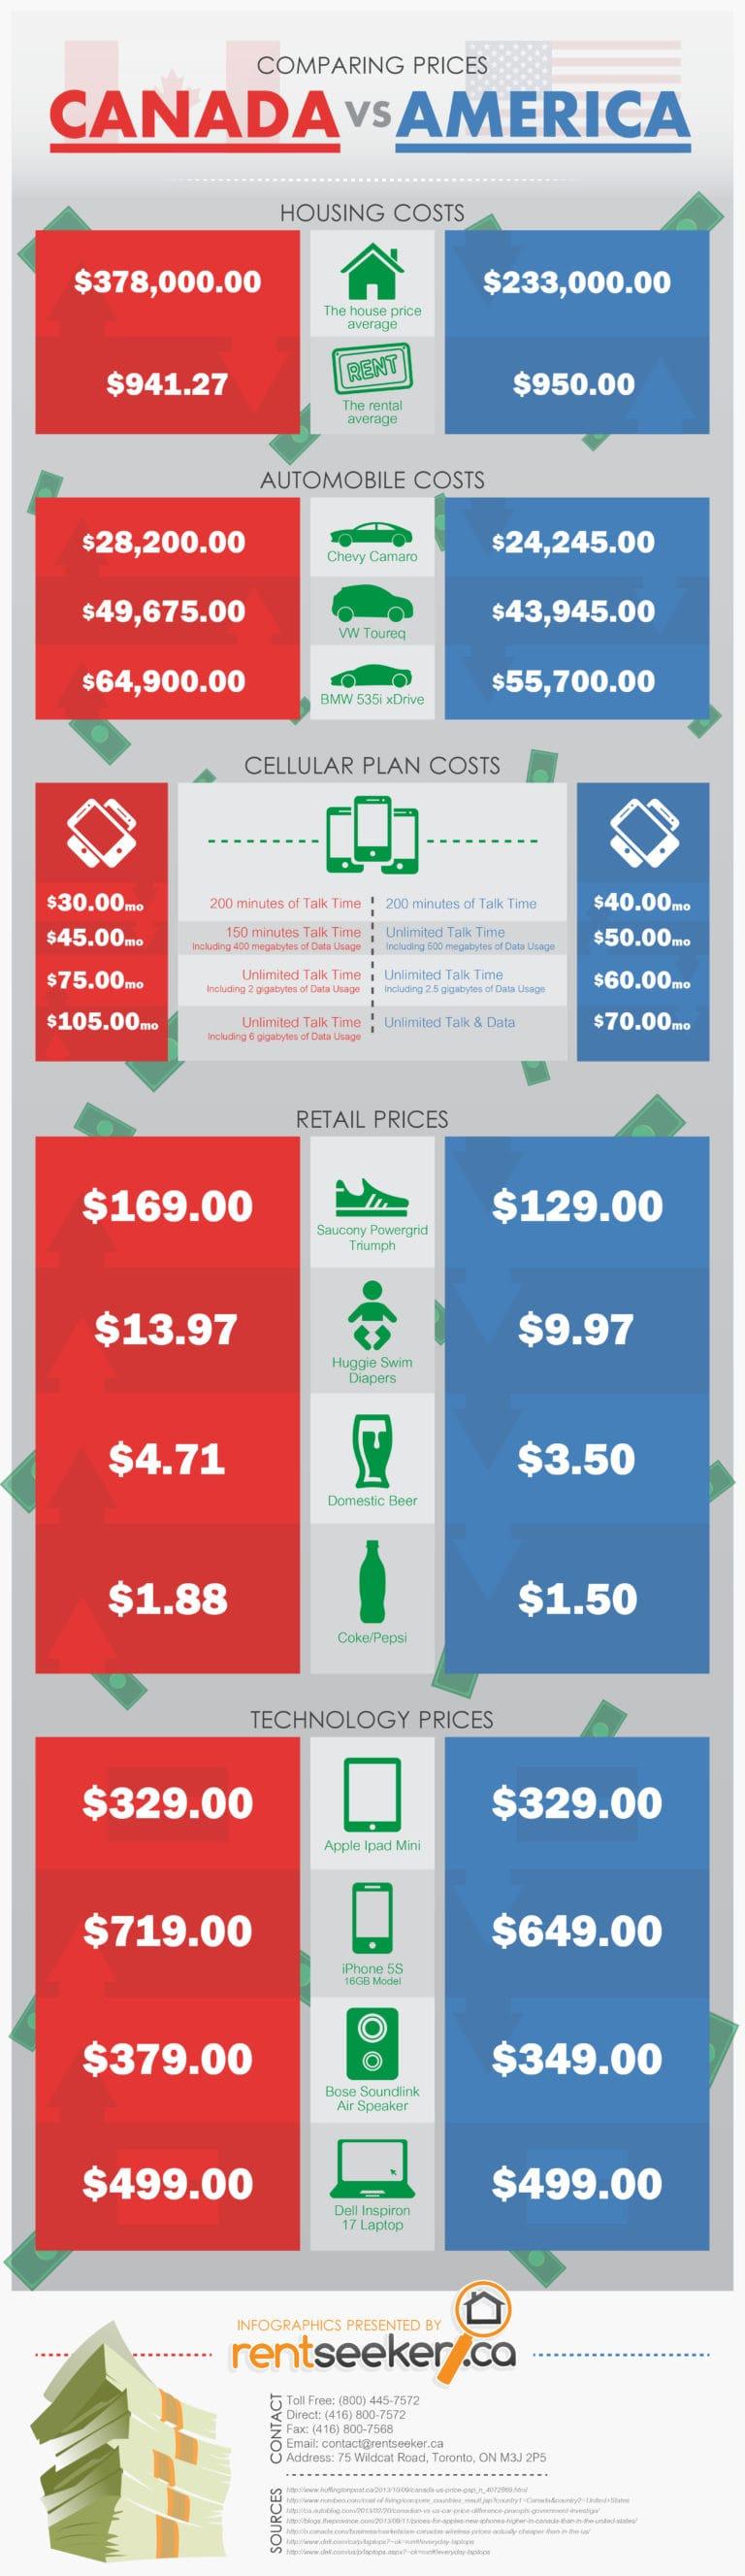 Canada vs. U.S. Pricing by RentSeeker.ca